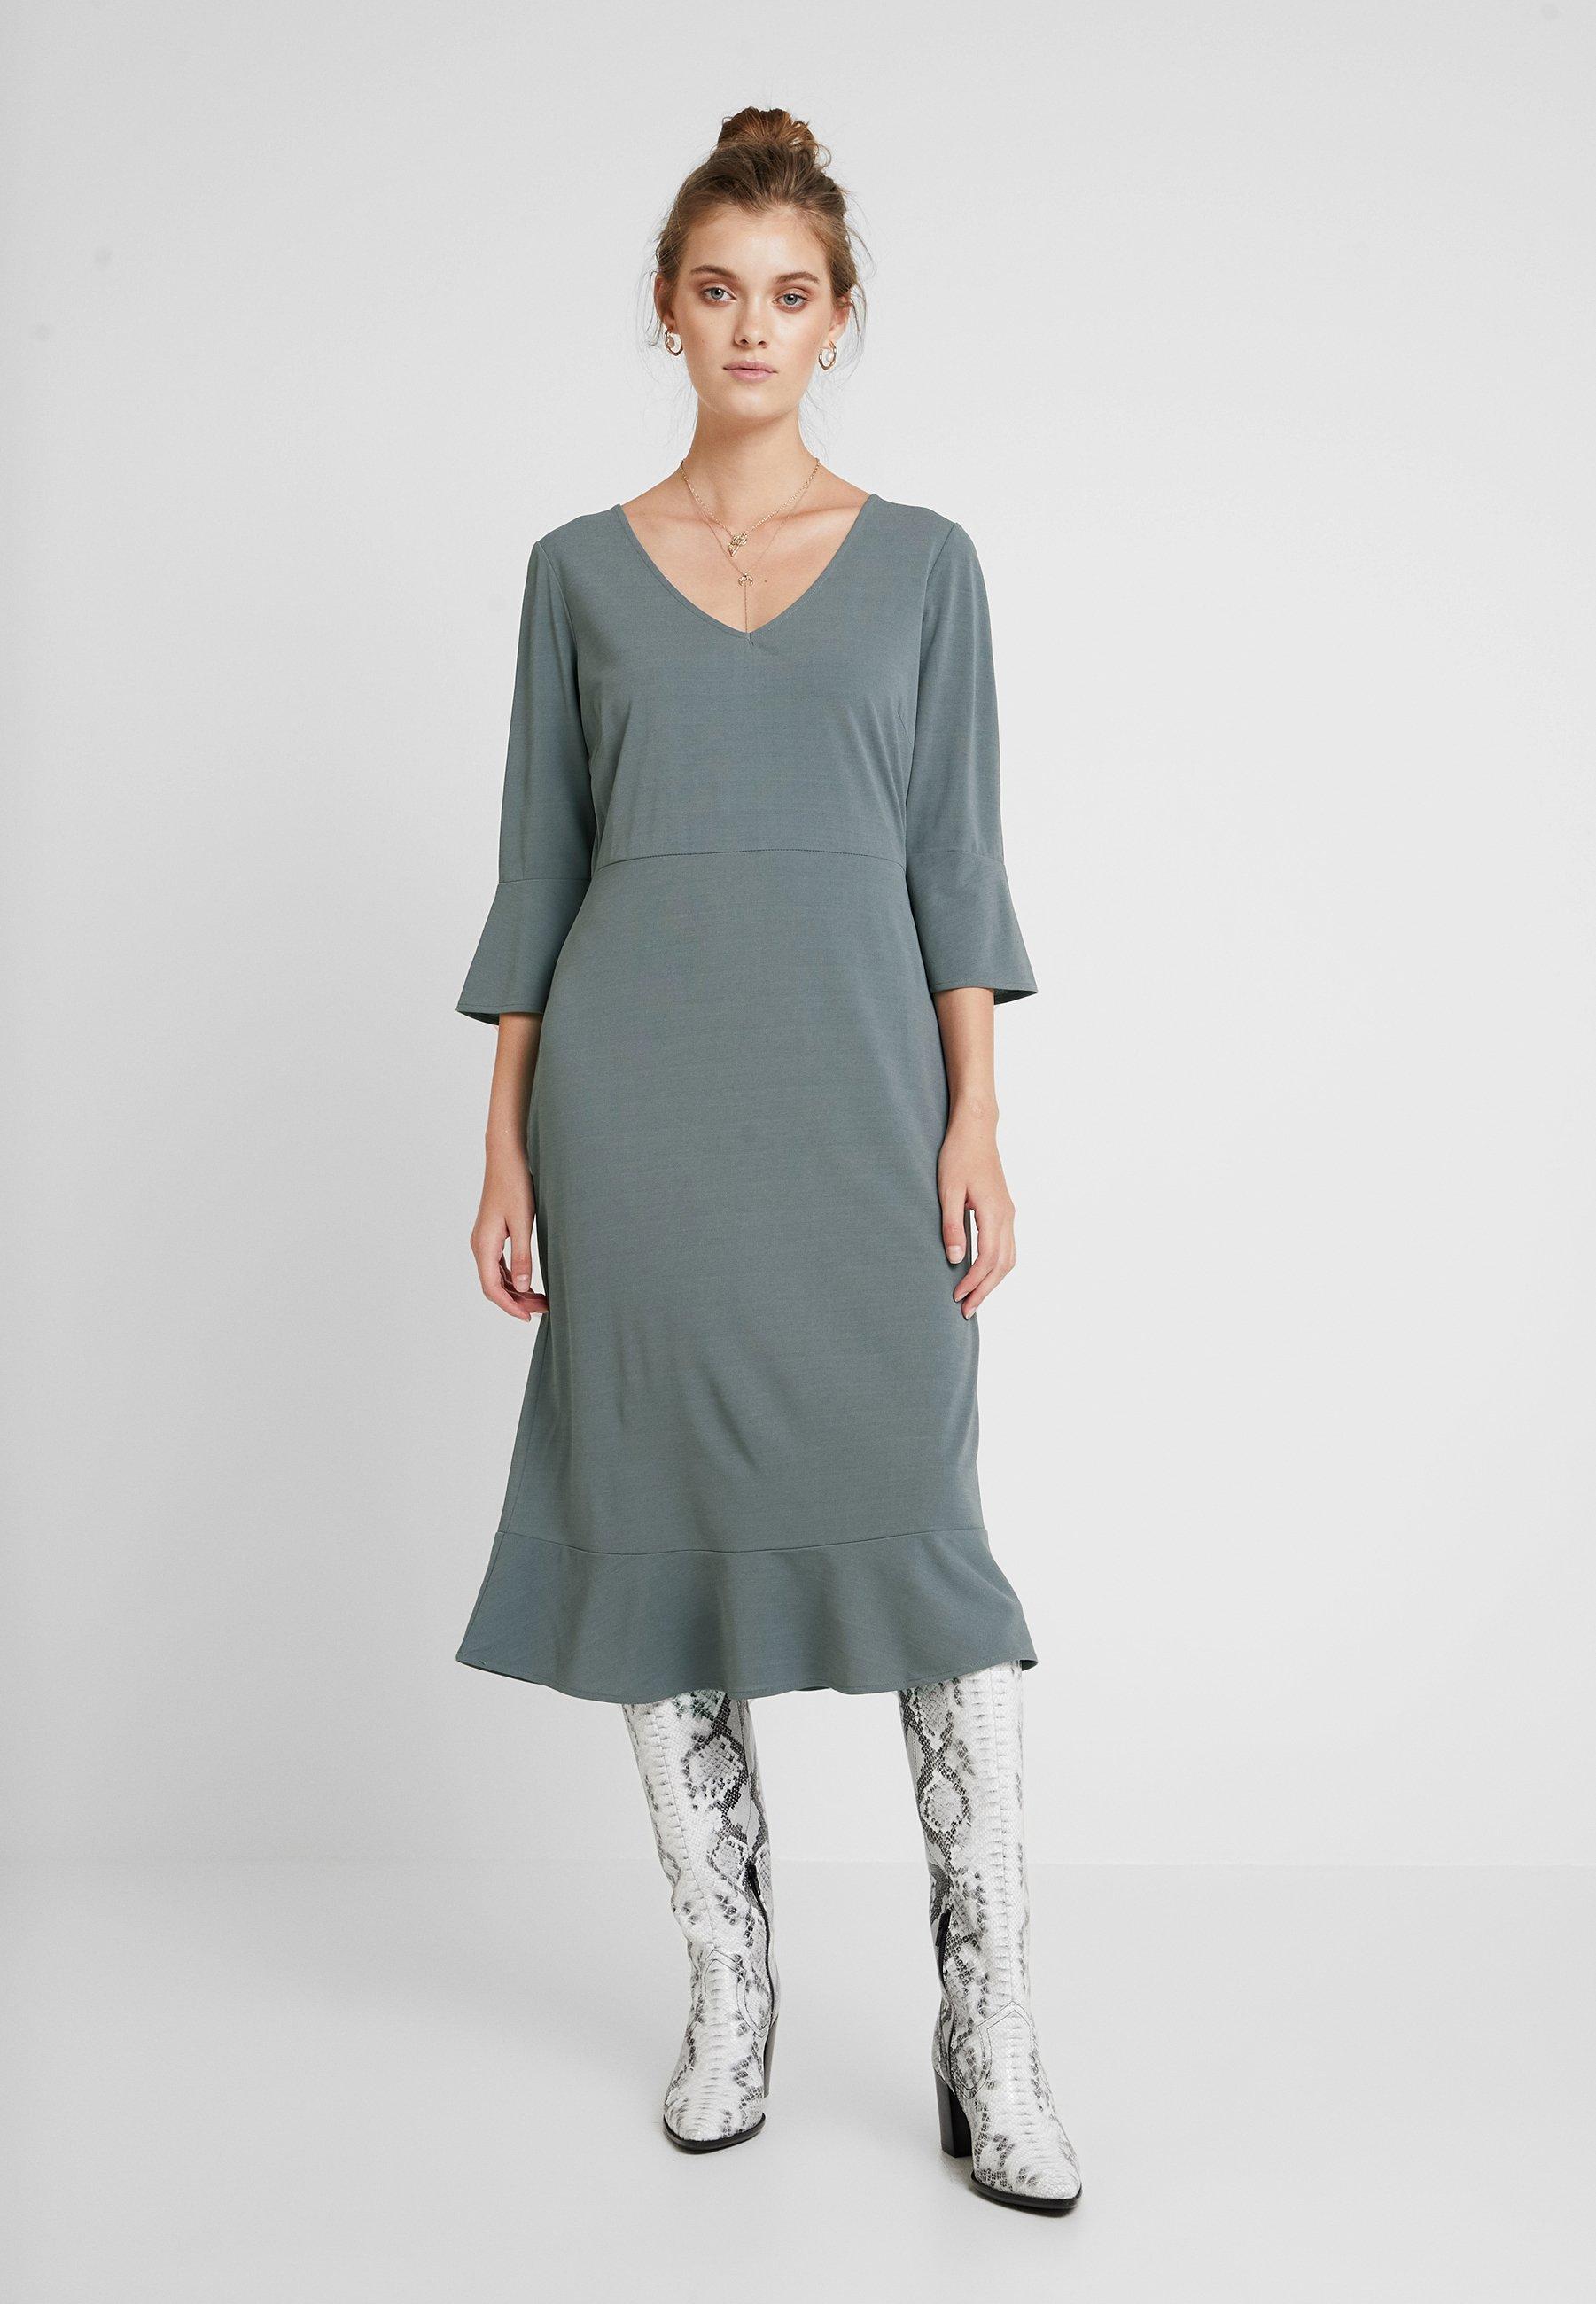 Gavrielle Sedona Sage And Less DressRobe New Longue bf6yIY7gv